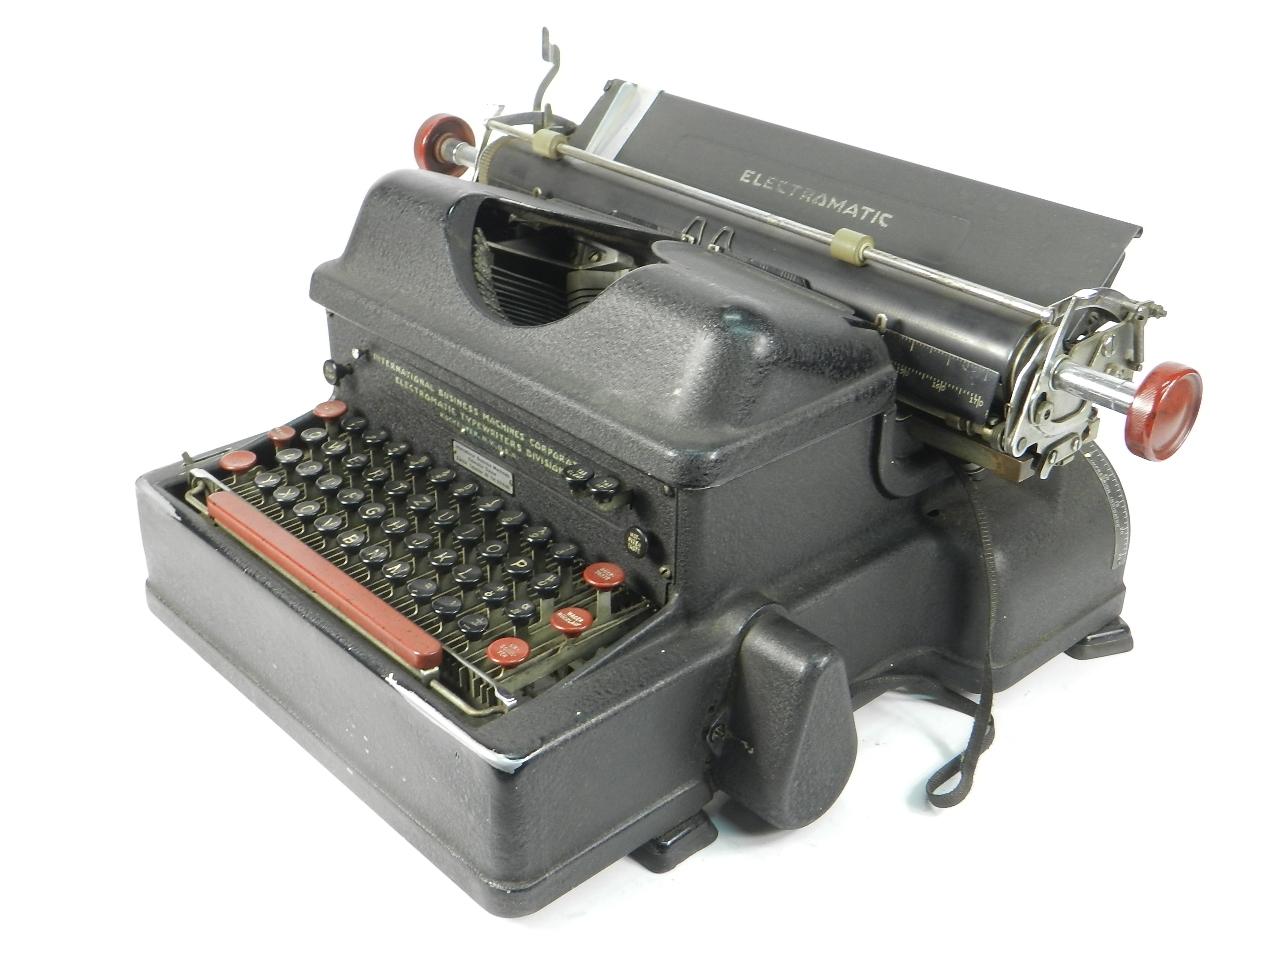 Imagen IBM ELECTROMATIC AÑO 1935 40294